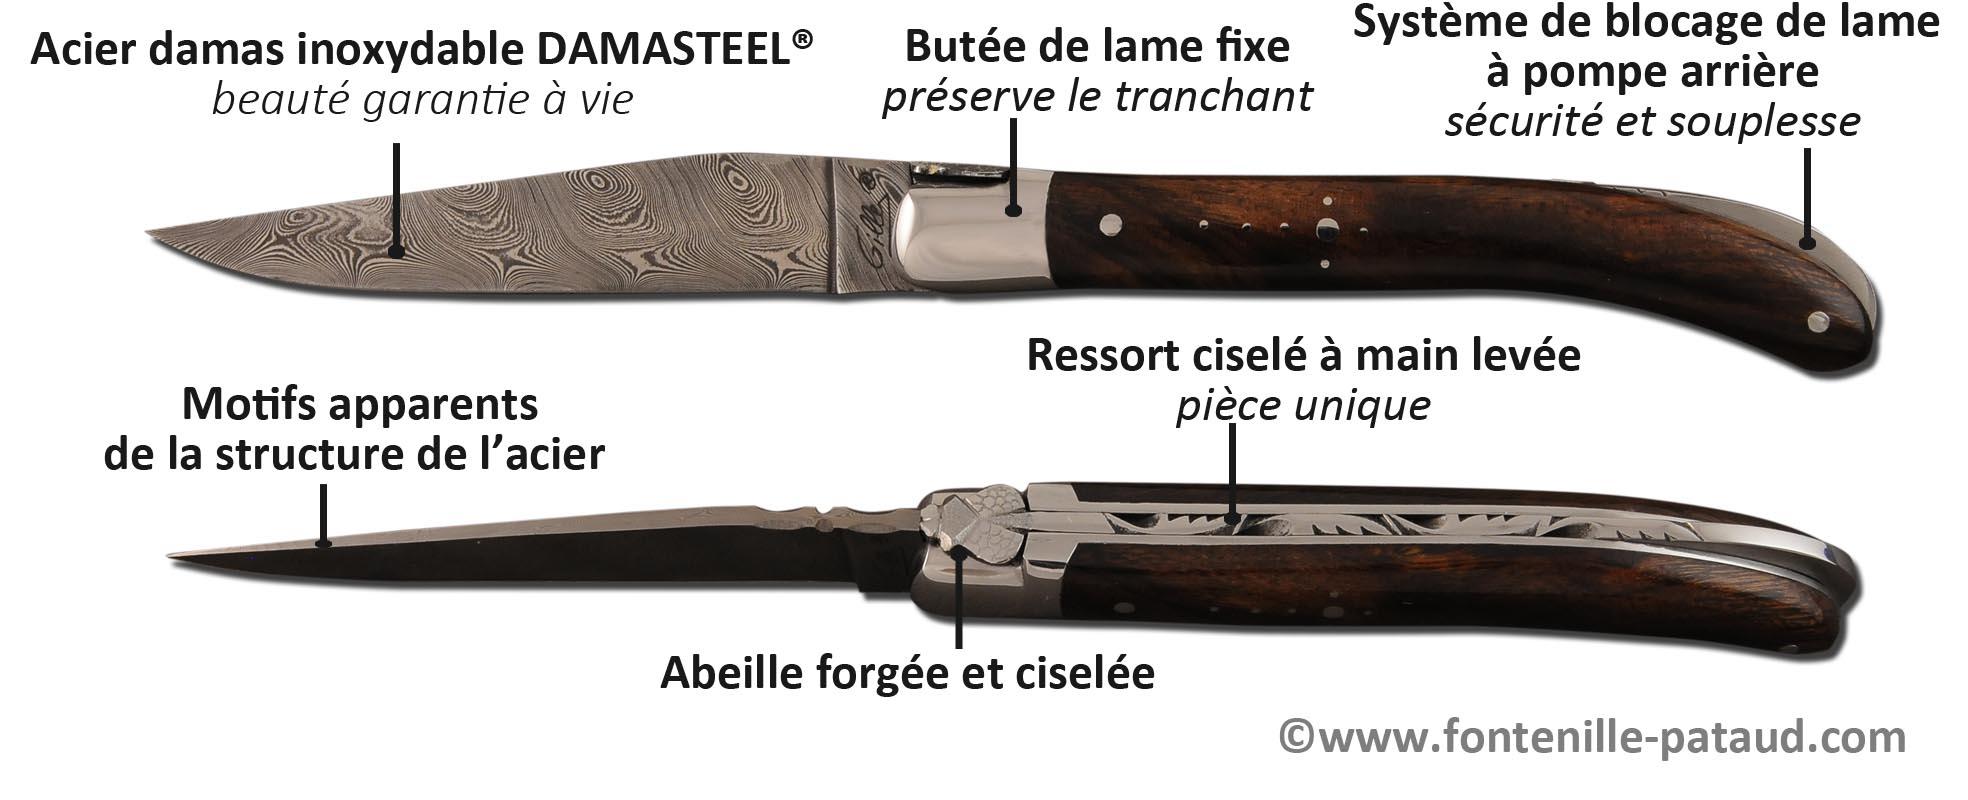 Couteau Laguiole le Pocket : 10.5 cm d'artisanant made in France